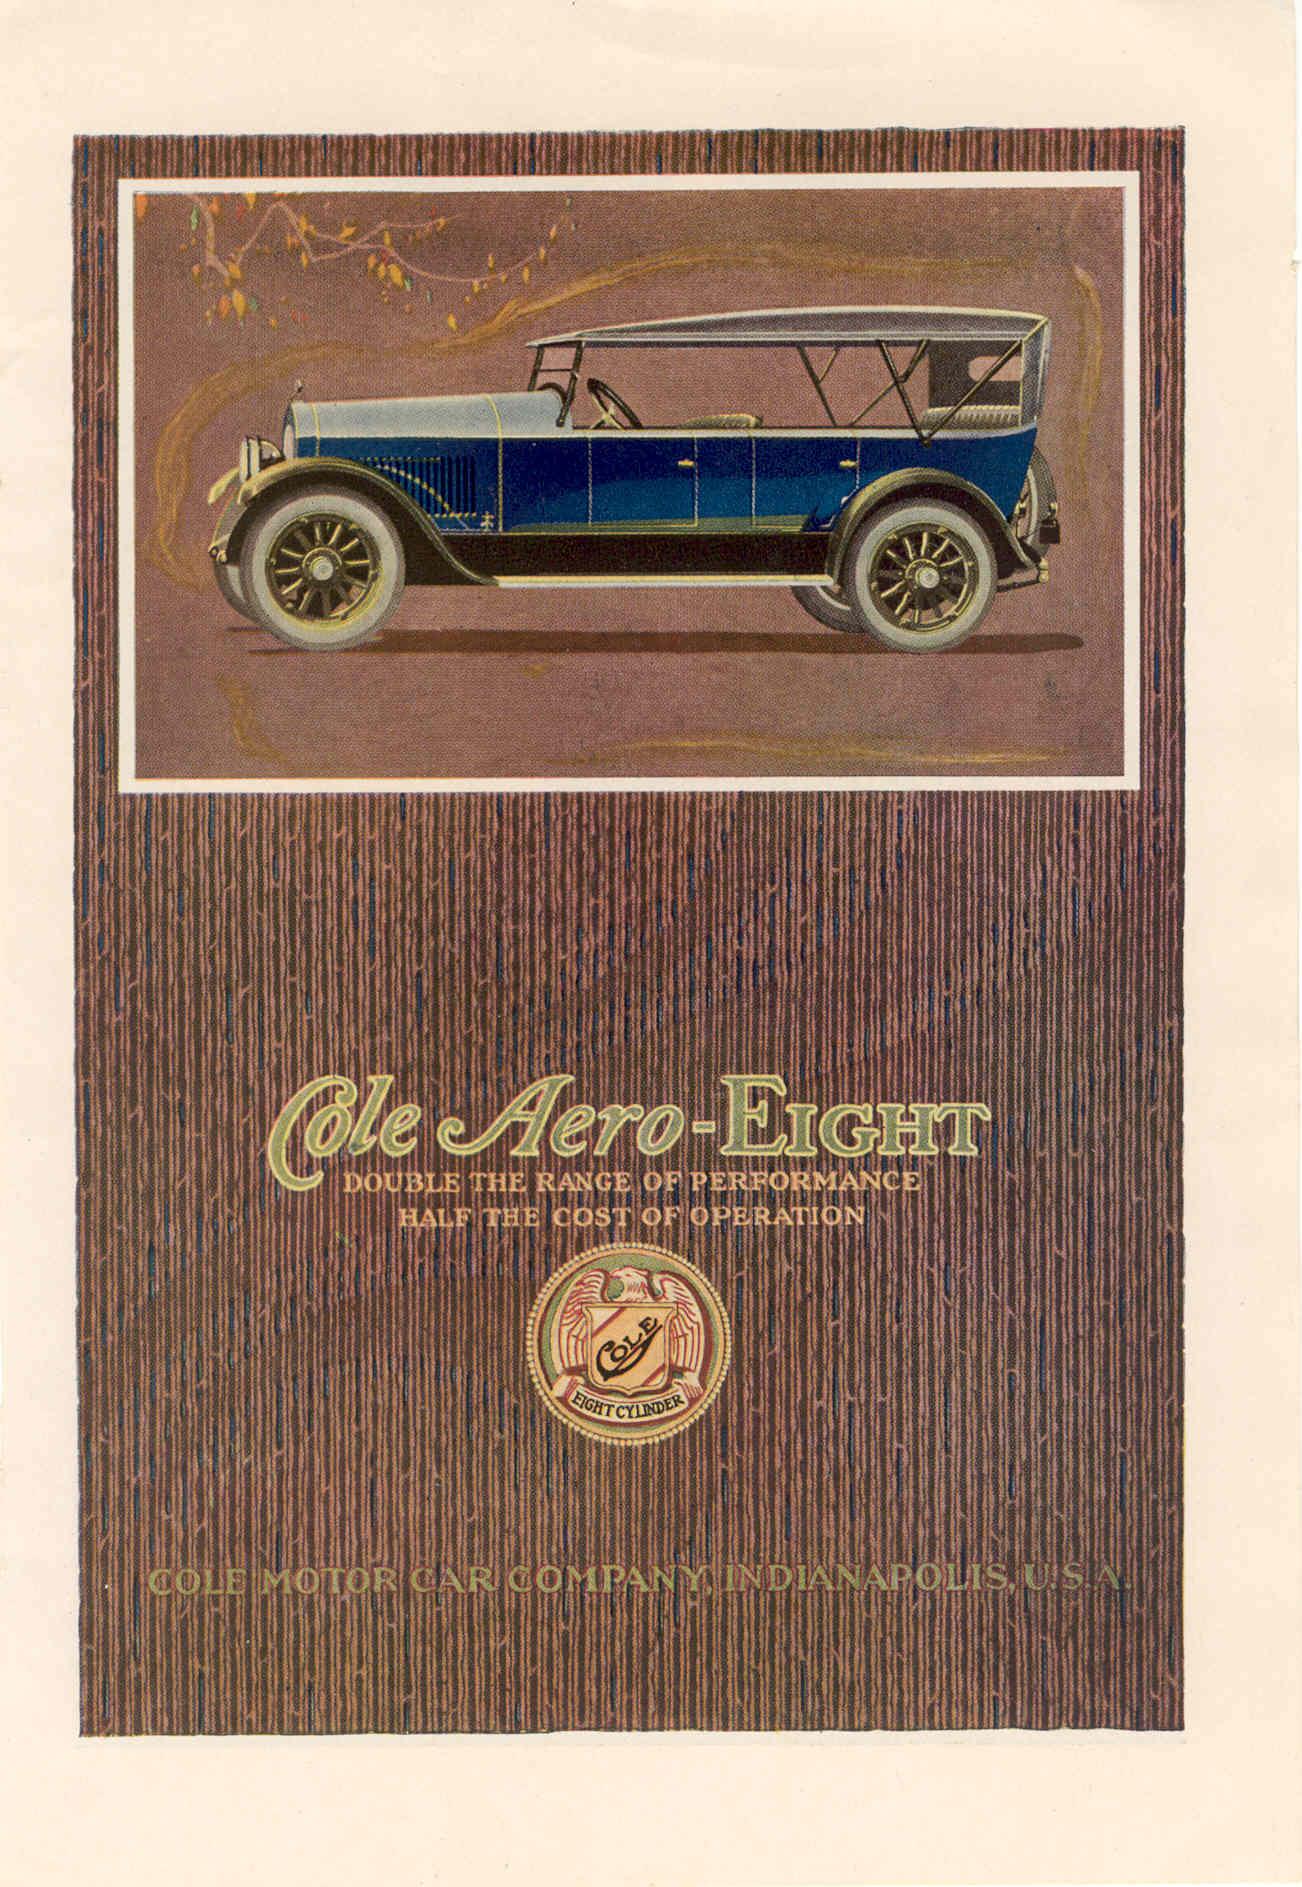 Happy Birthday to the Cole Motor Car Company